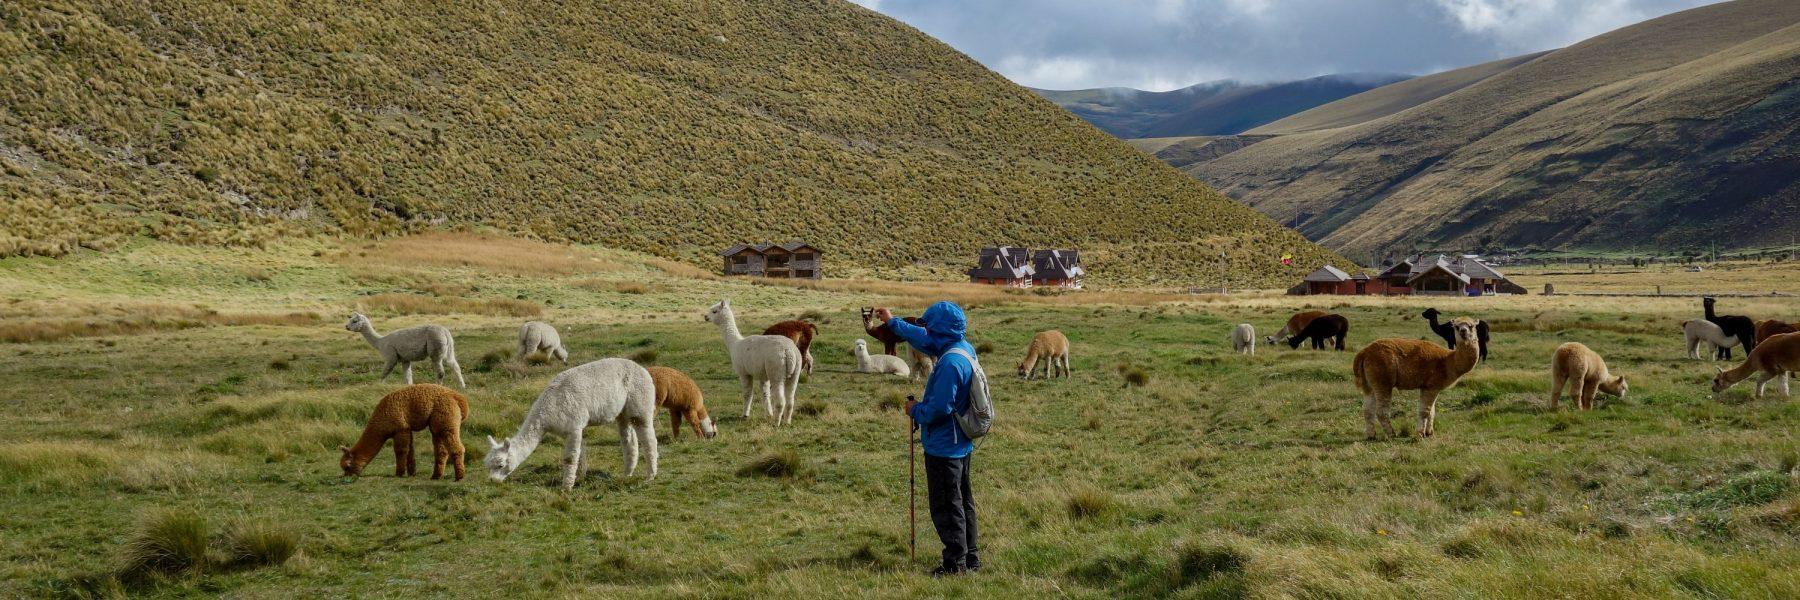 Alpacas on Mount Chimborazo, Ecuador